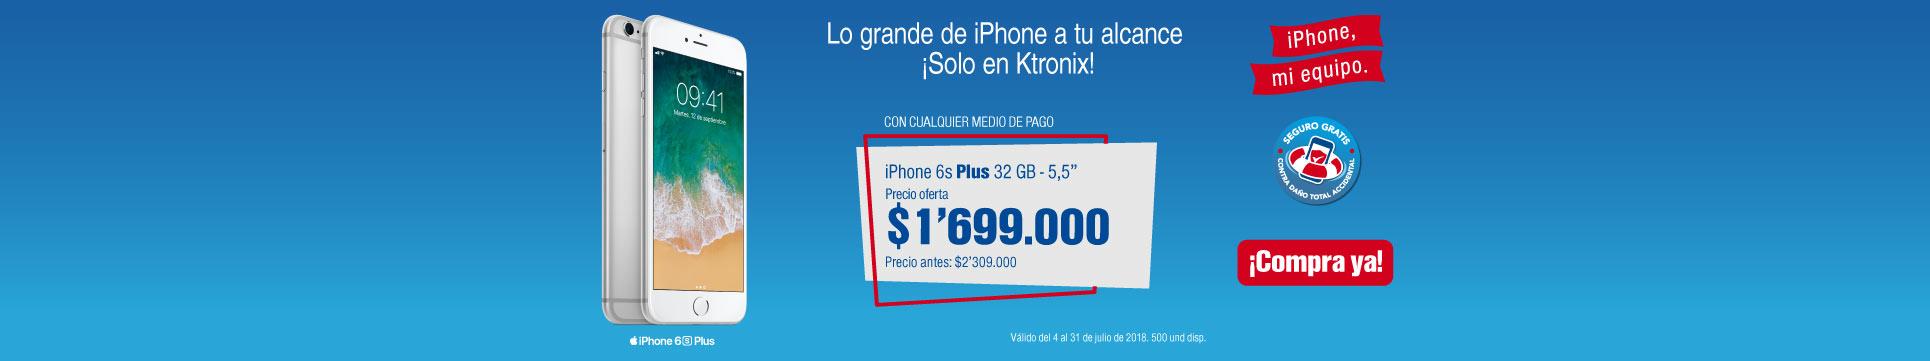 KT-BCAT-10-celulares-PP-EXPM-Iphone-6sPlus-Jul10